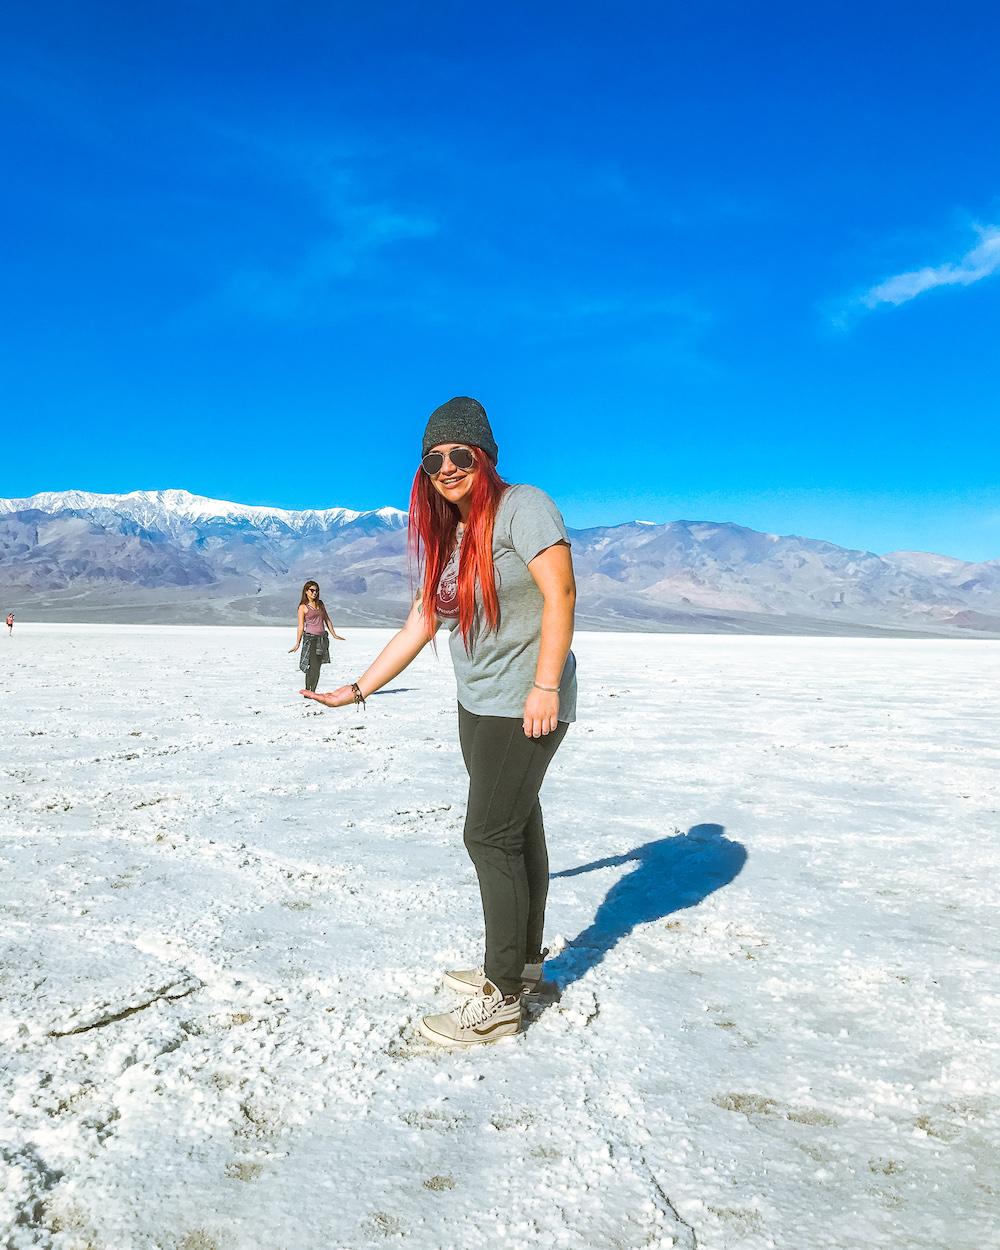 woman at badwater basin salt flats california death valley national park perspective shot